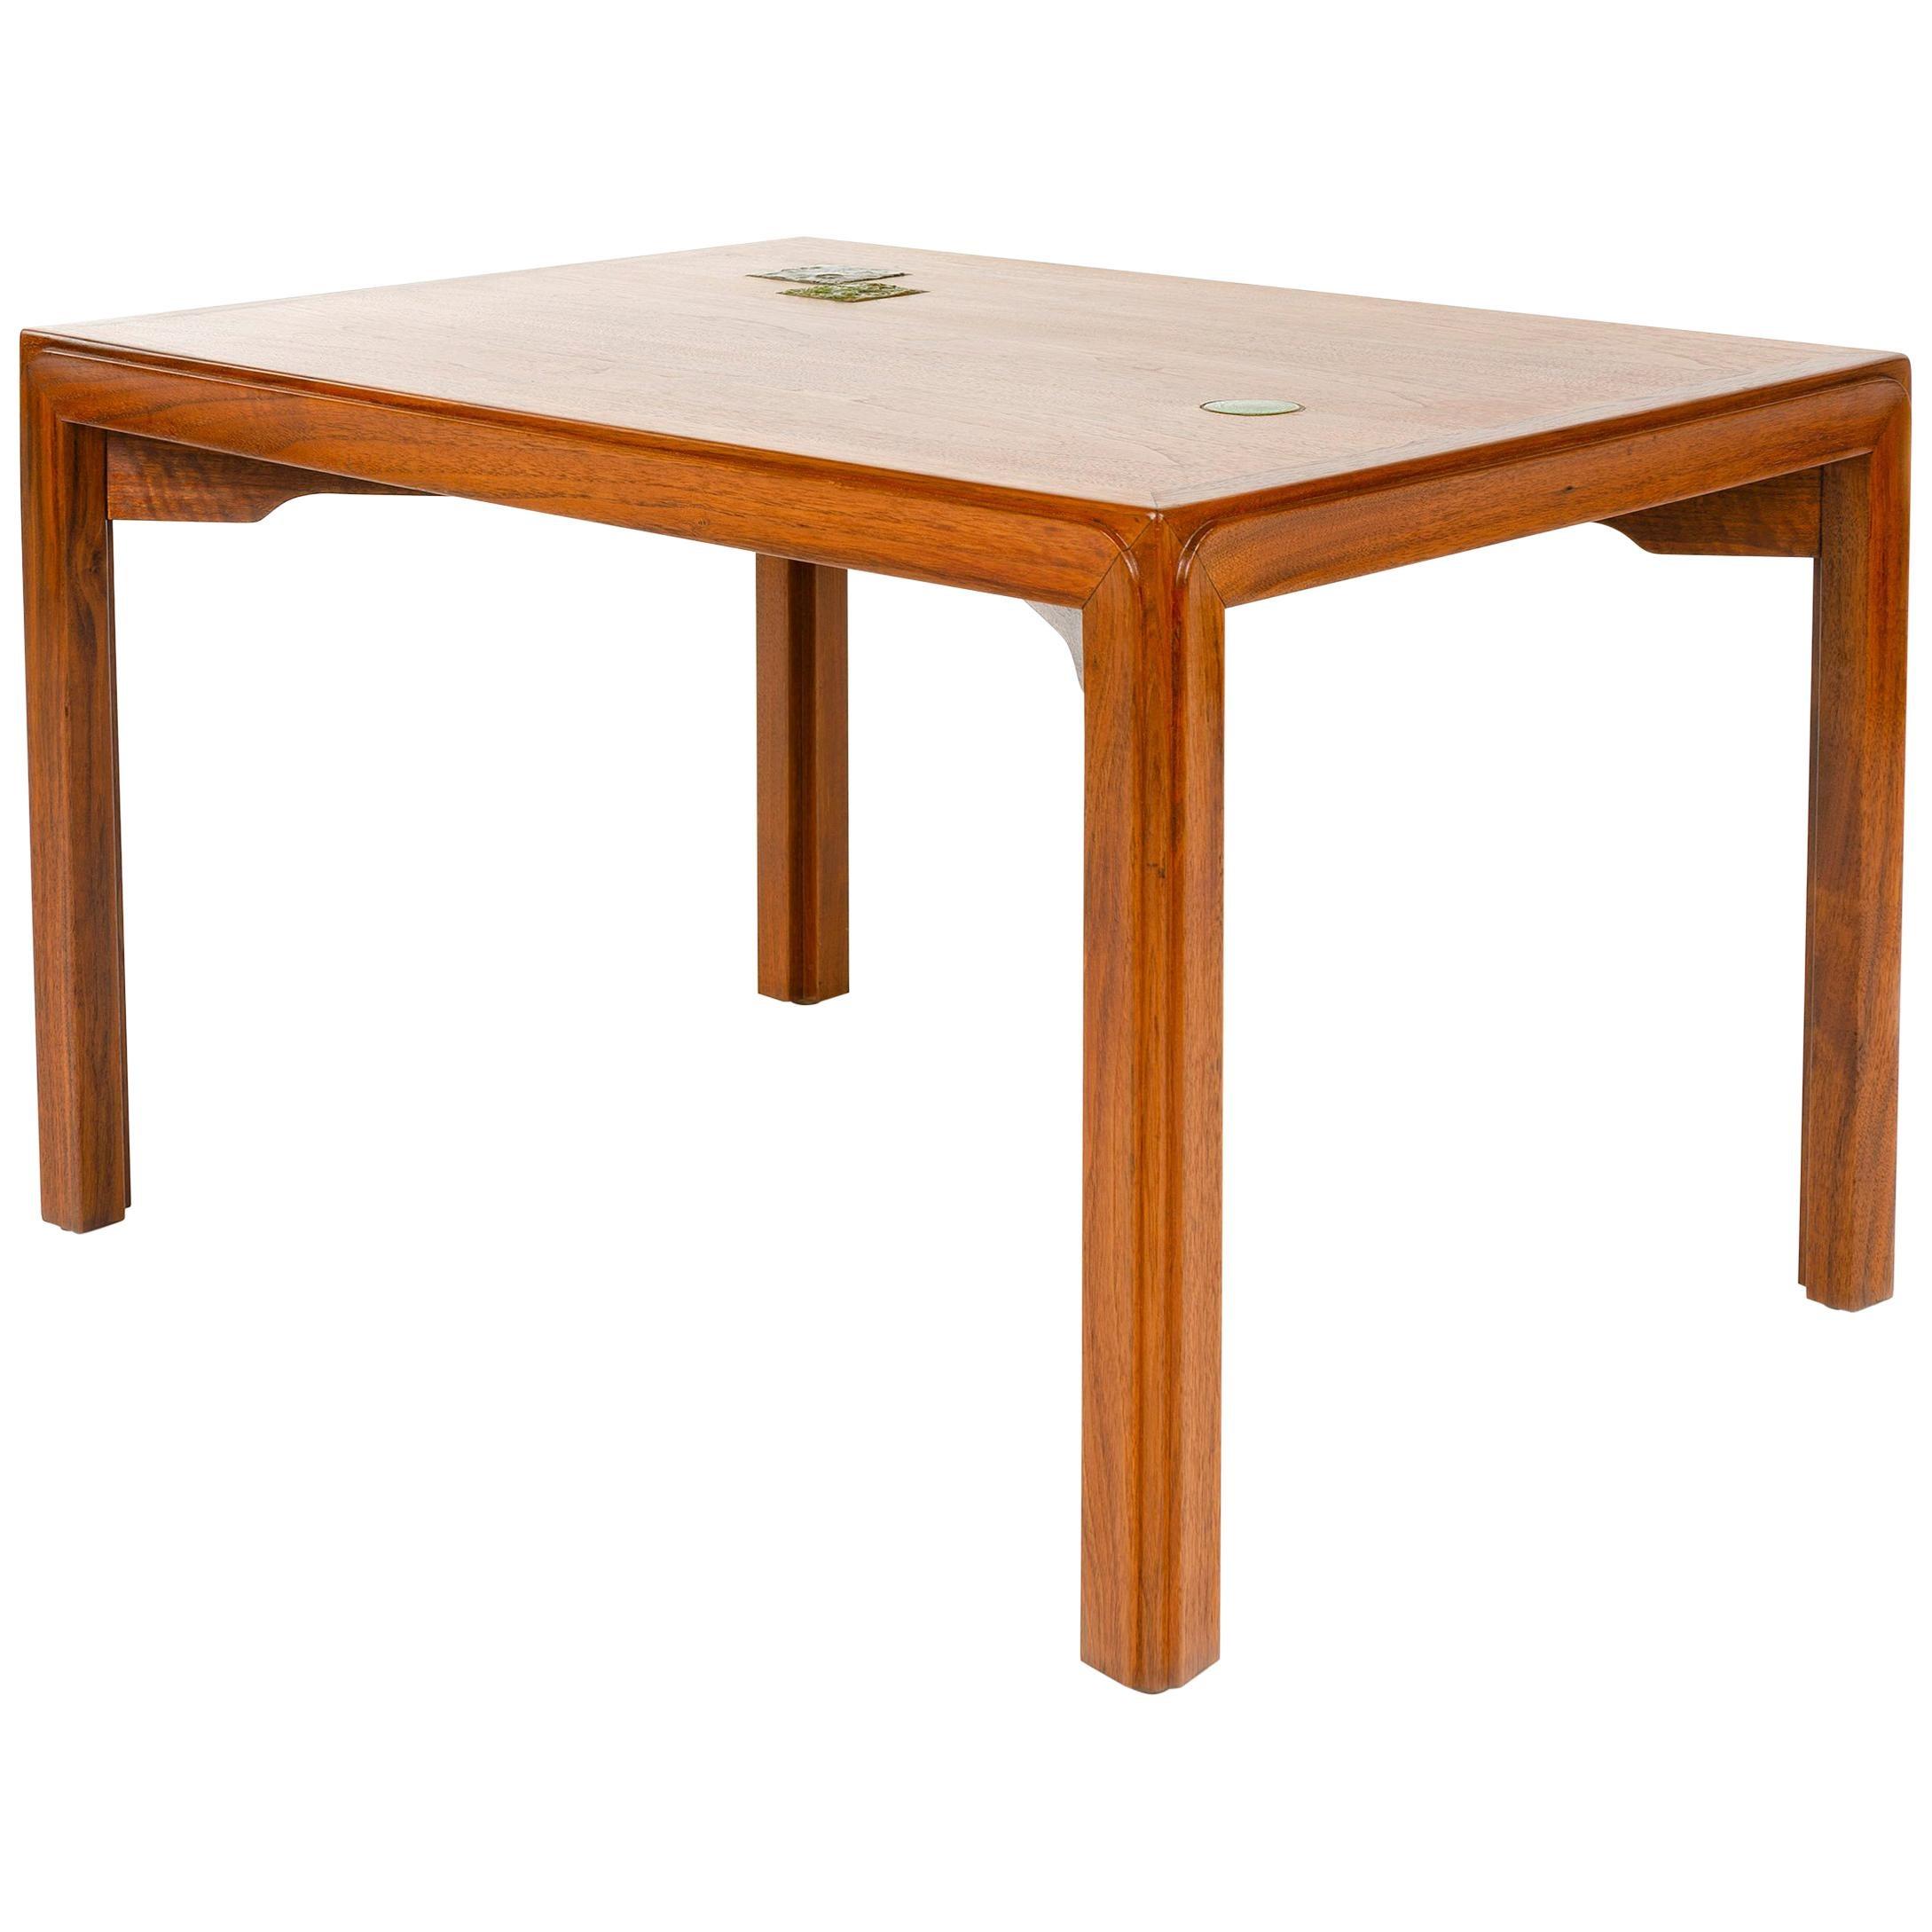 1950s Walnut 'Janus' End Table by Edward Wormley for Dunbar